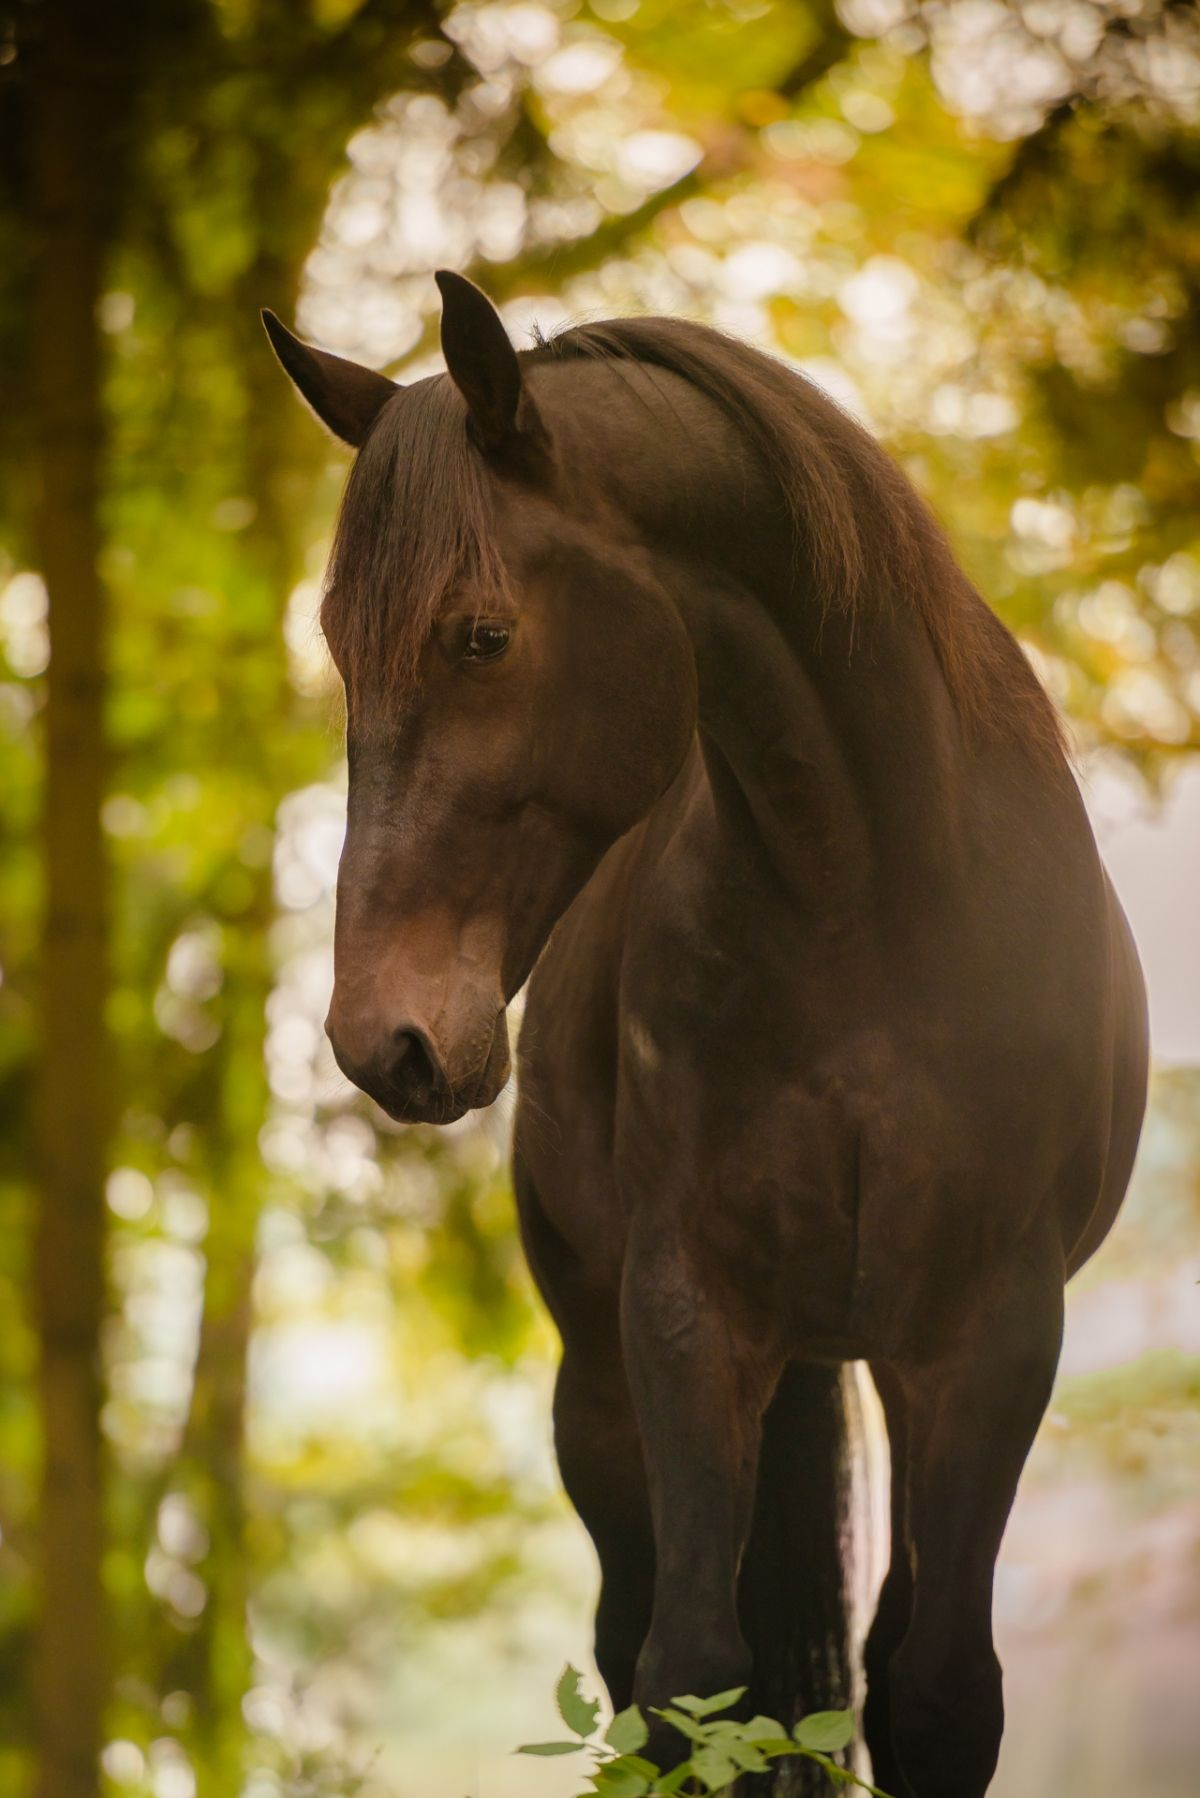 Pferdefotografie Hundefotografie Einzigartige Pferdefotos